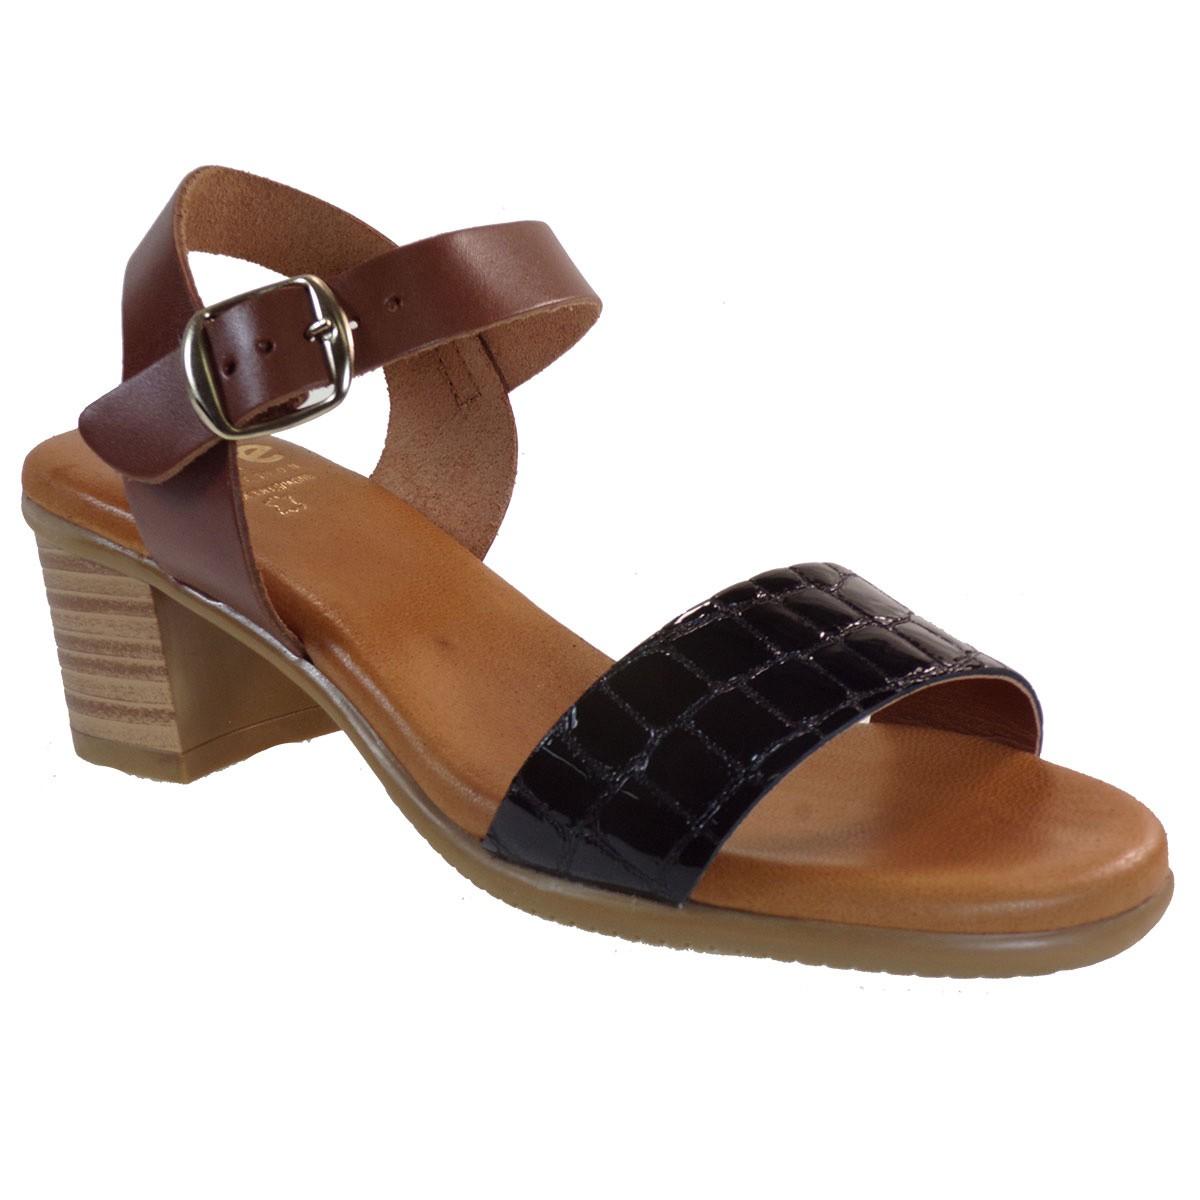 ette Shoes Γυναικεία Πέδιλα Δερμάτινα 660-GINA Μαύρο